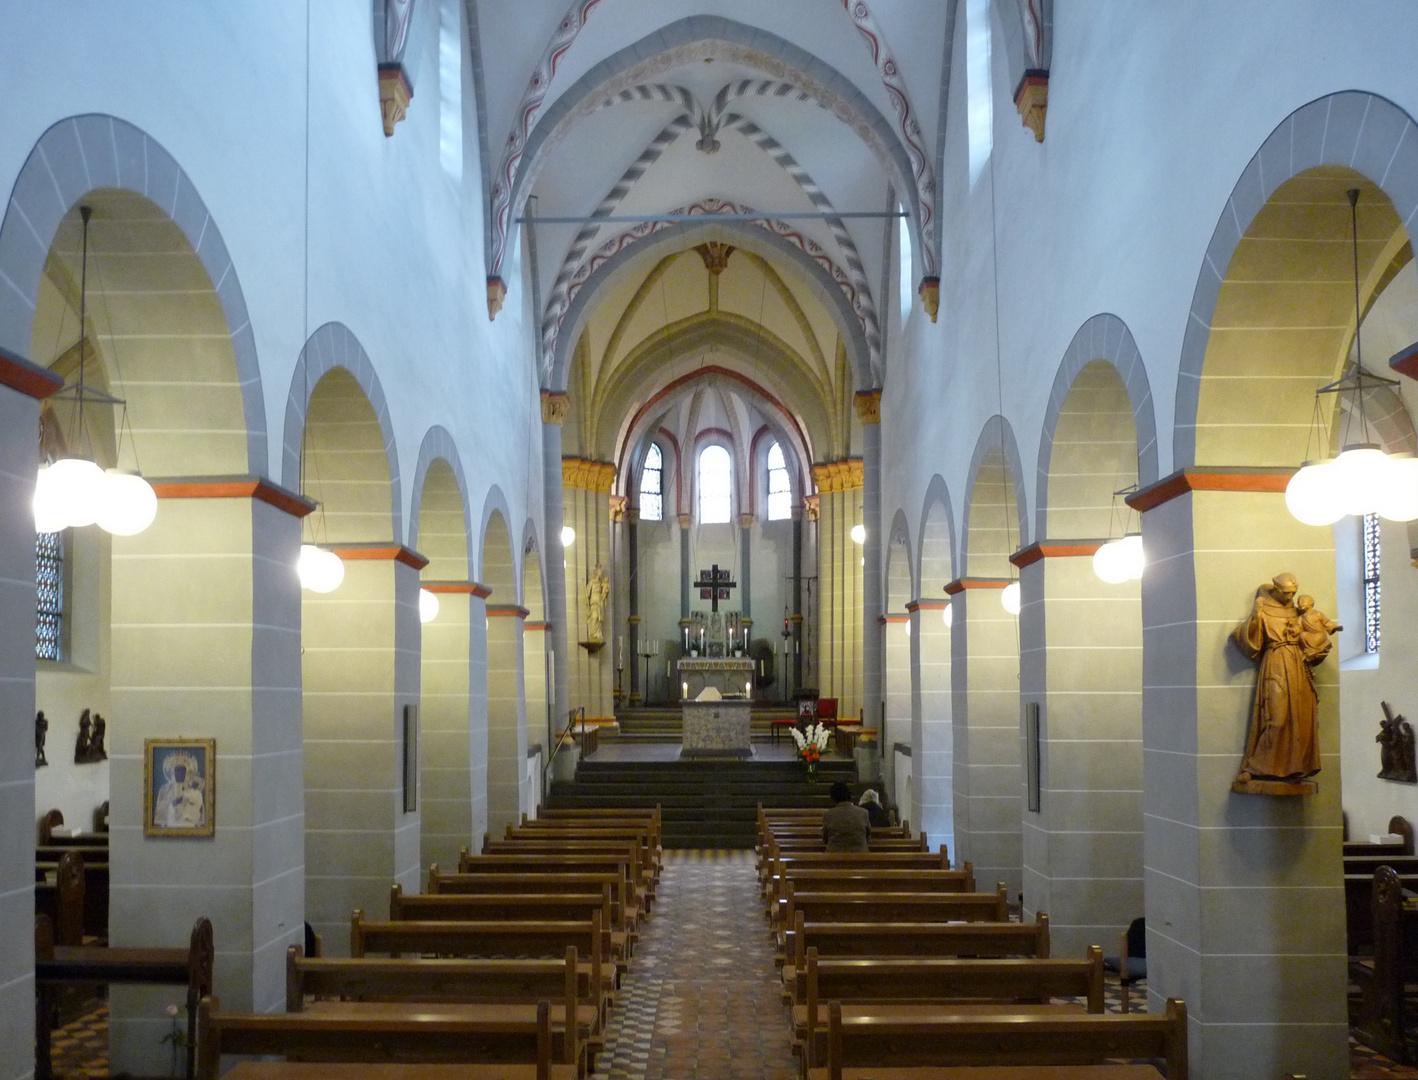 Kath. Kirche St. Pankratius, Oberpleis